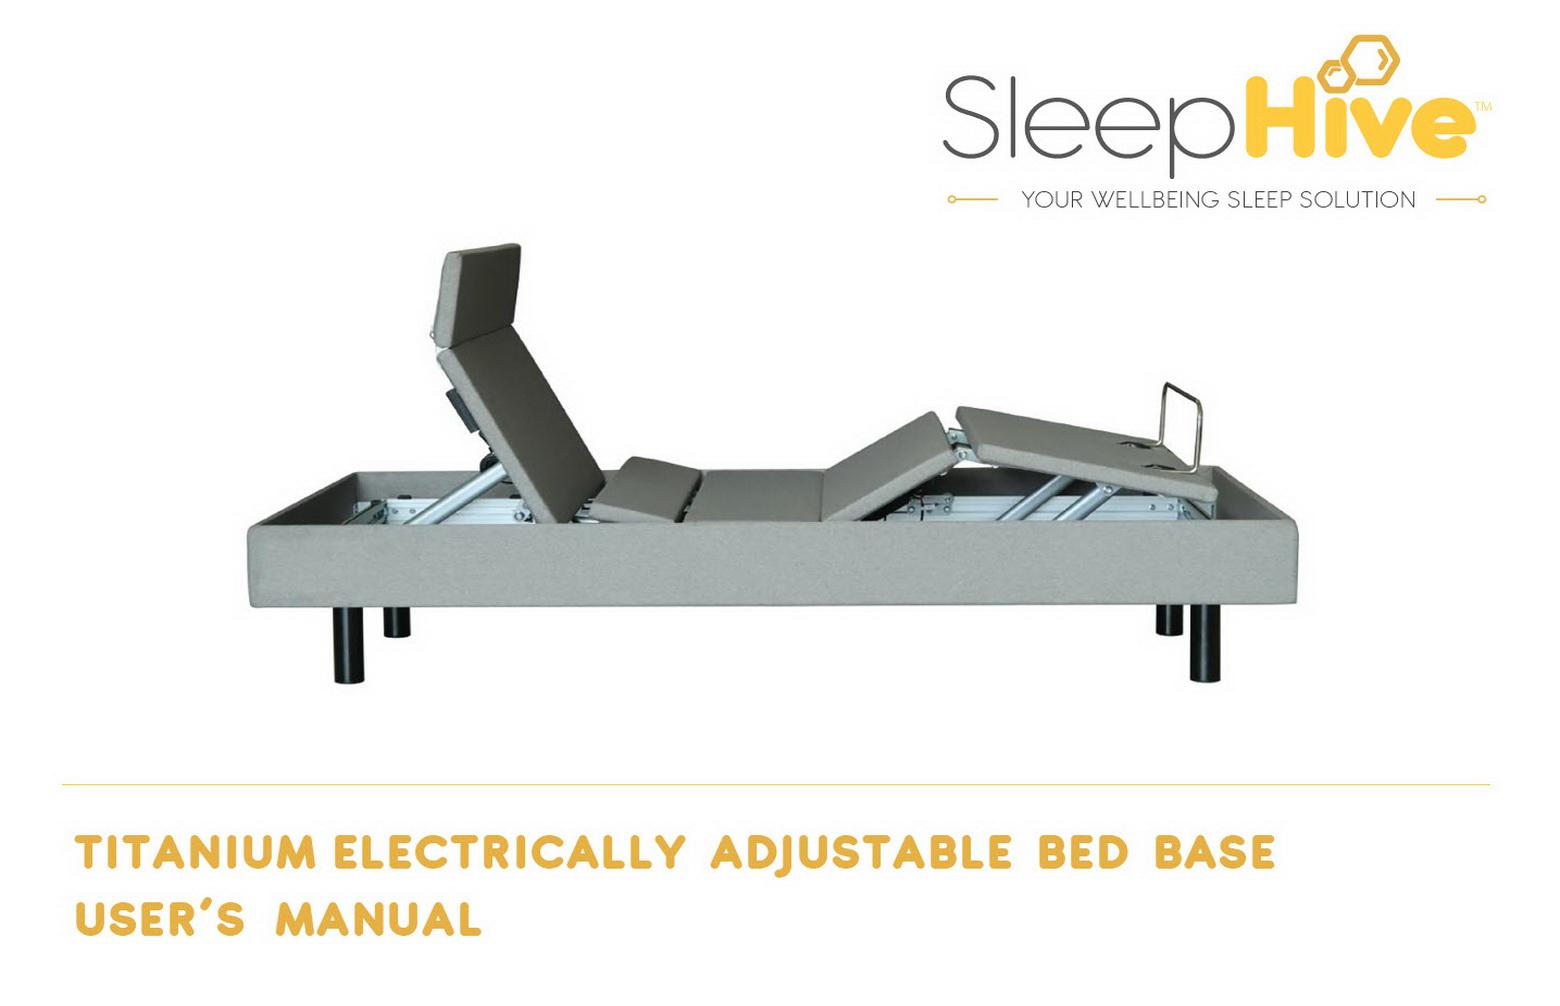 https://sleephive.com.au/wp-content/uploads/2021/08/Titanium-Bed-Cover.jpg